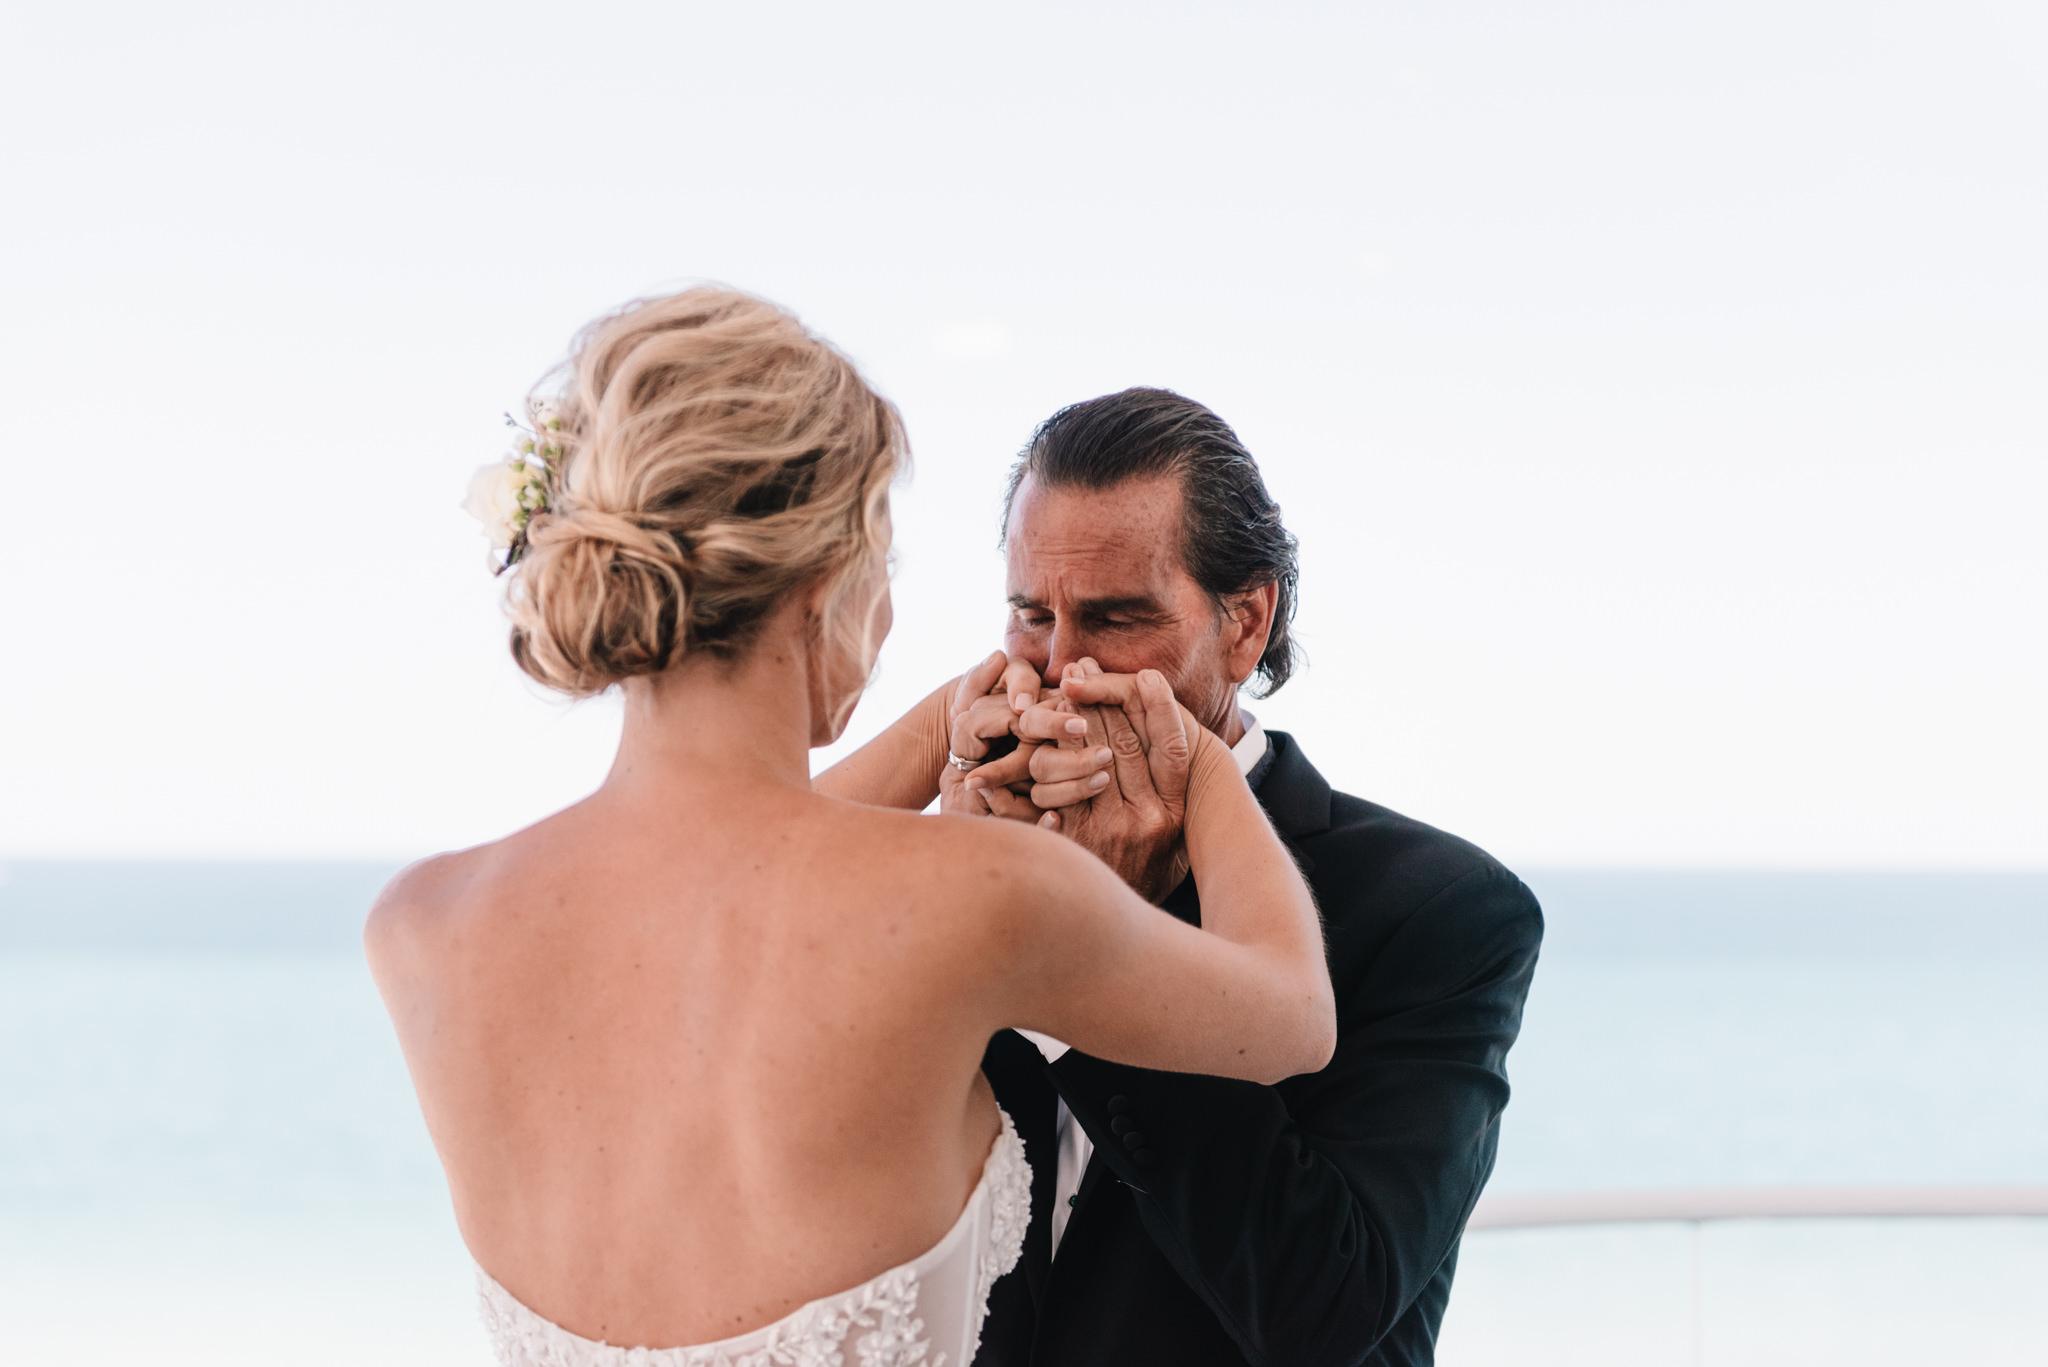 Reportage photographie de mariage